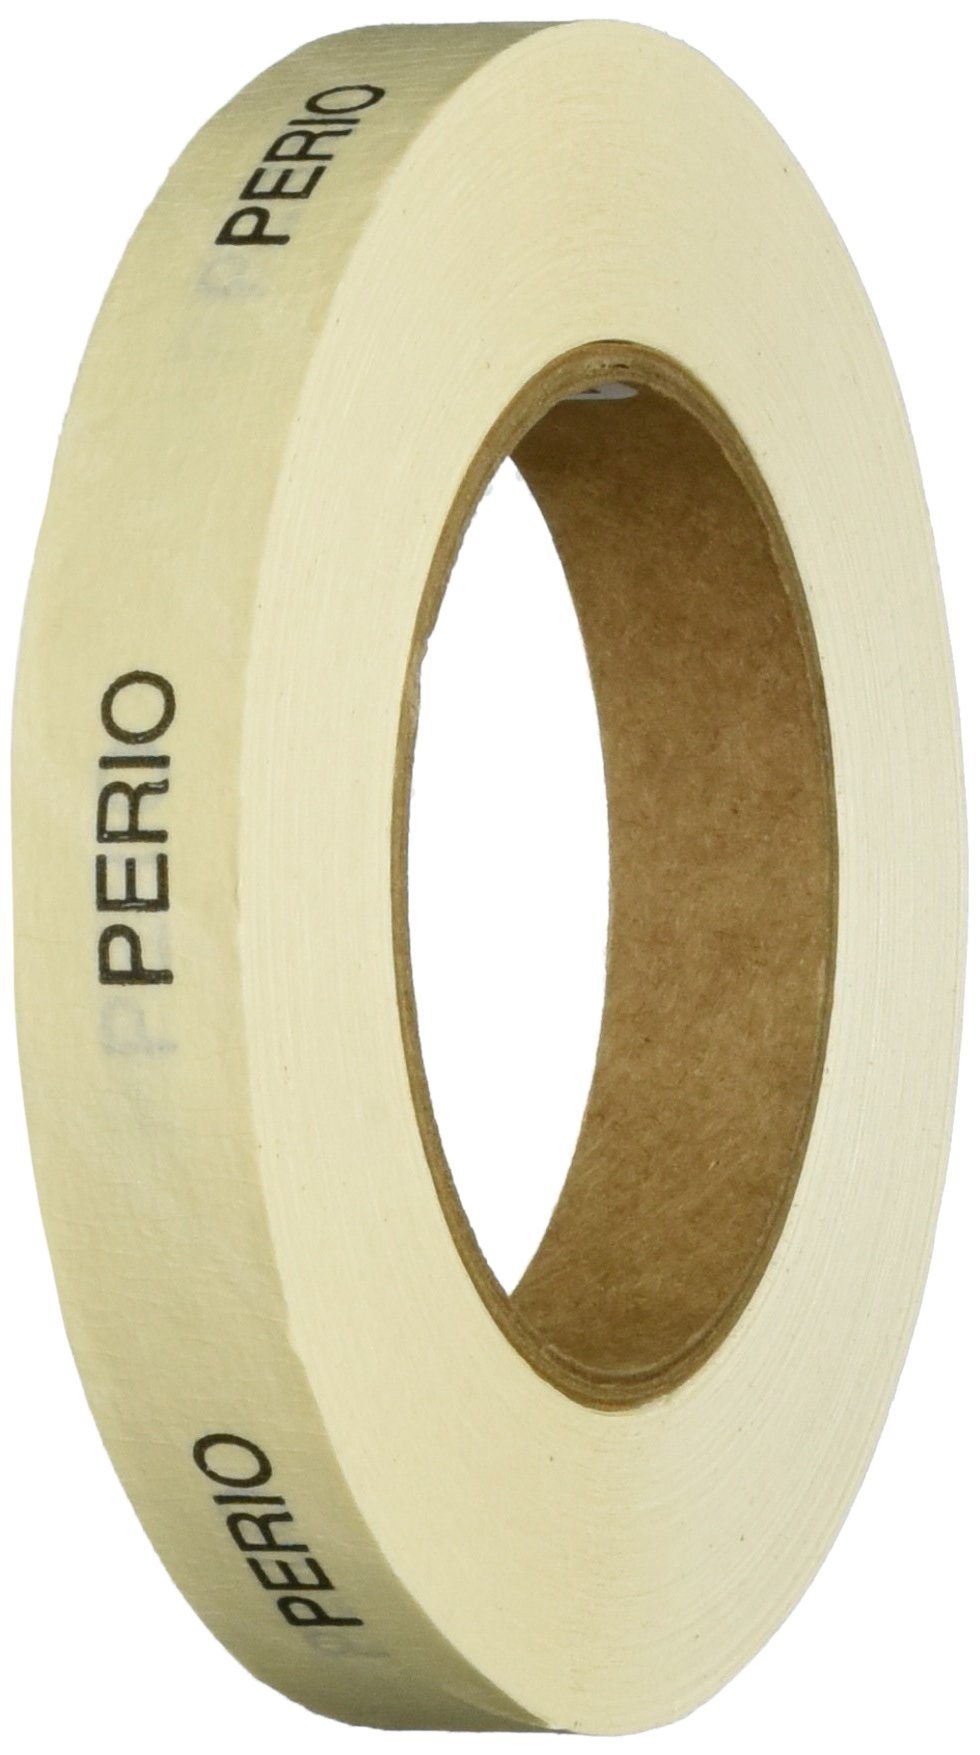 Hu-Friedy IMS-1258 Autoclave Monitor Tape, 3/4'' Length, 55 mm Length, Perio